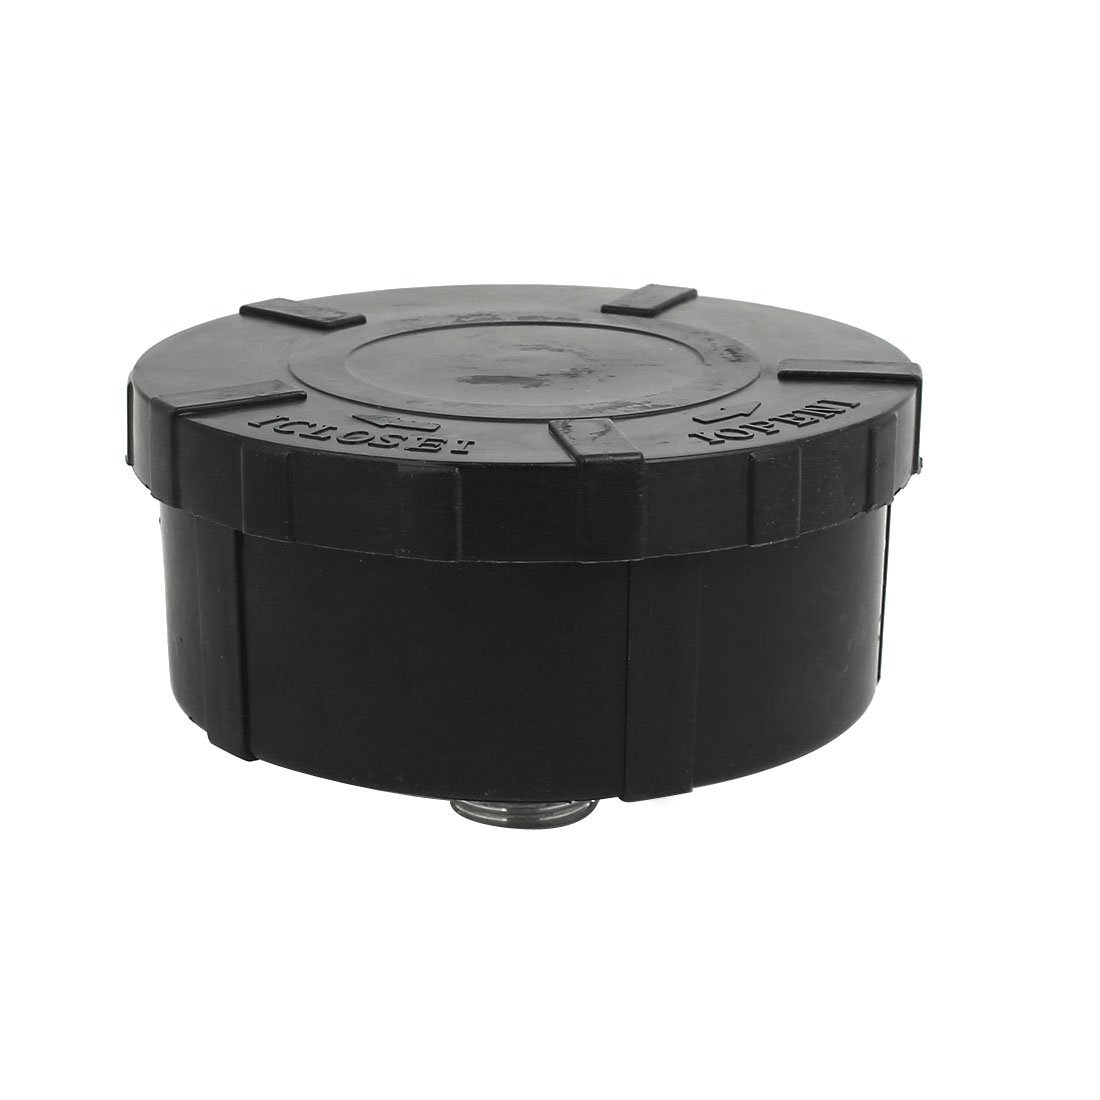 sourcingmap® 3/4PT Male Thread Plastic Shell Air Compressor Silencer Filter US-SA-AJD-363990